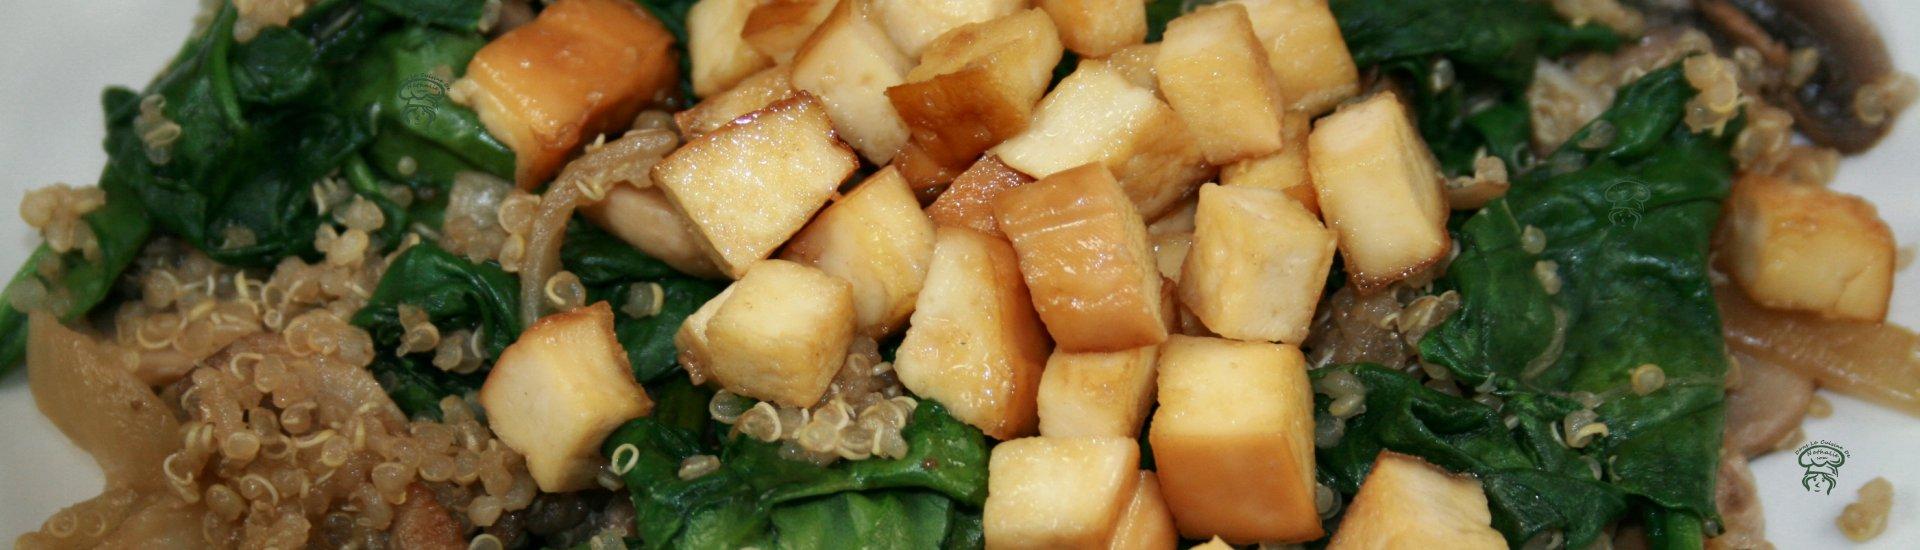 Quinoa aux champignons, épinards & tofu fumé